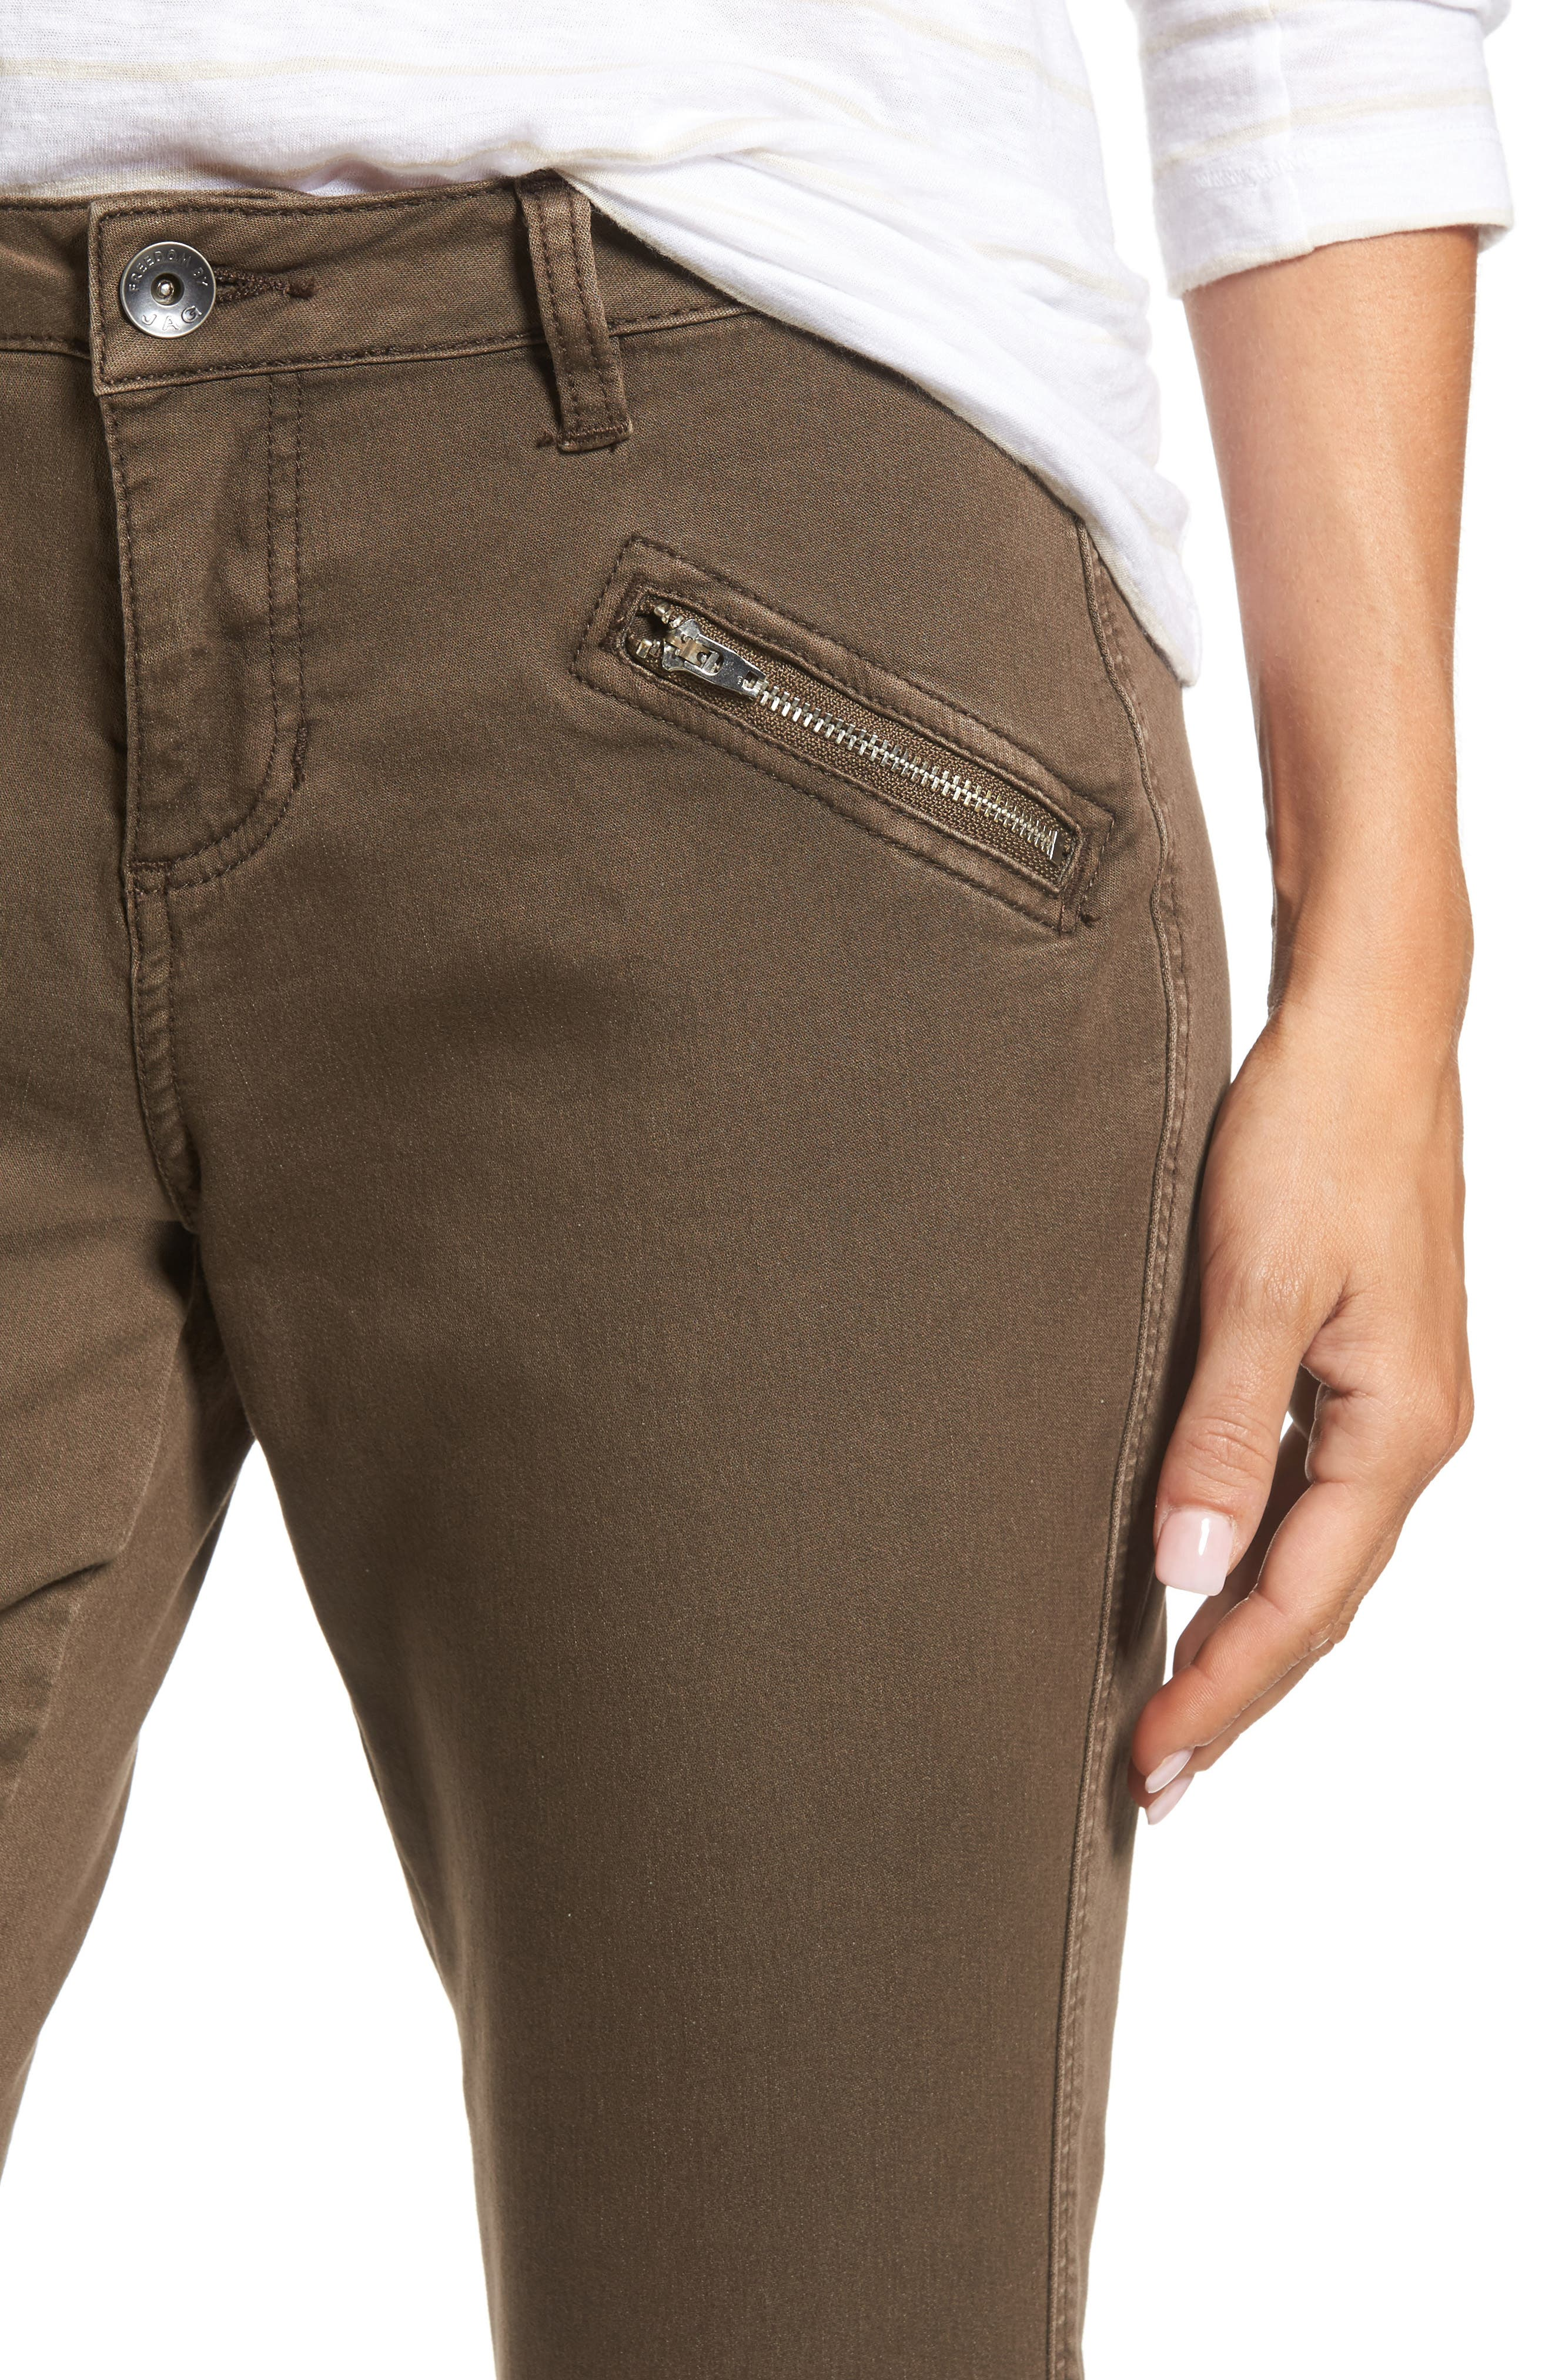 Ryan Knit Skinny Jeans,                             Alternate thumbnail 4, color,                             Saddle